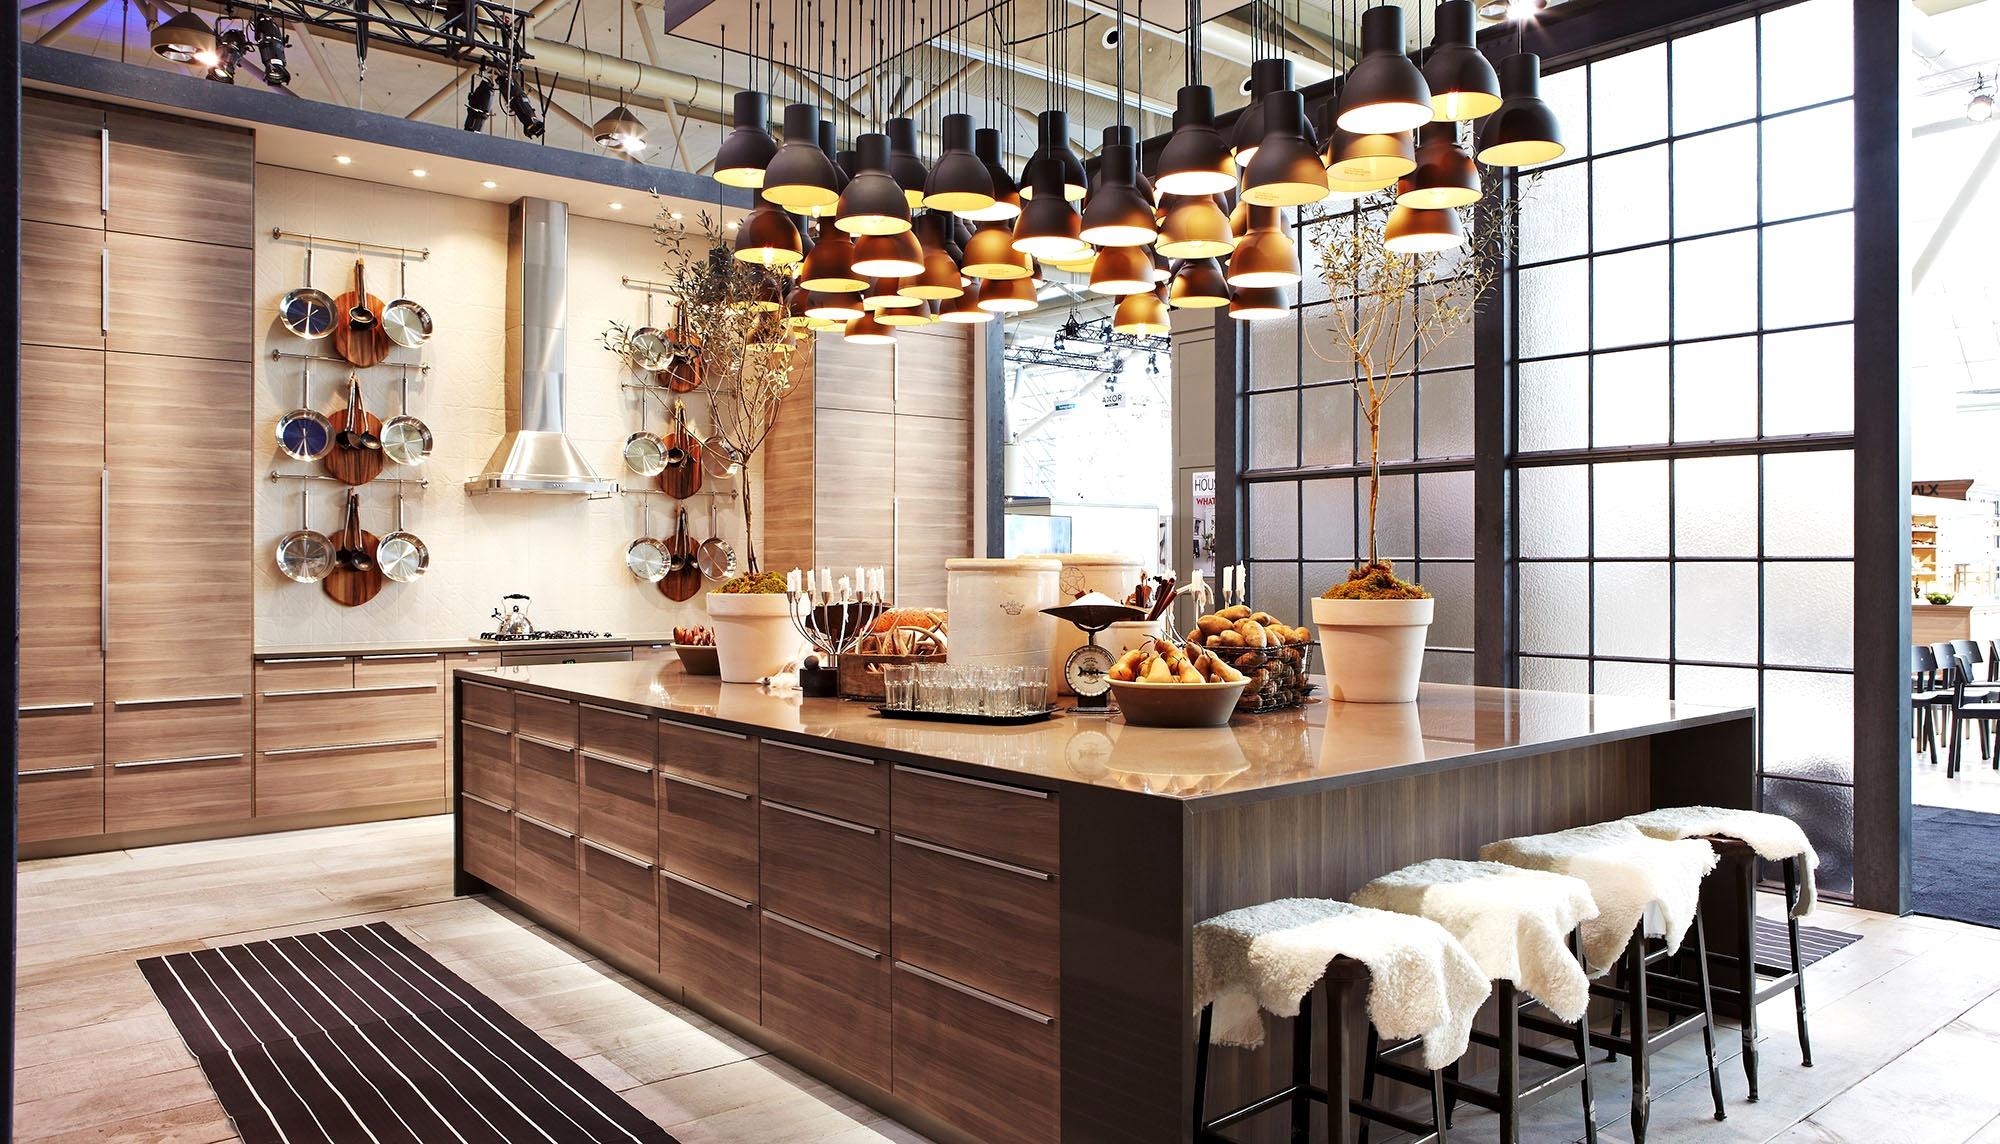 Ikea Cuisine toulouse Nouveau Photos Table Ronde Ikea Frais Ilot Central Cuisine Ikea Prix Ilot Cuisine